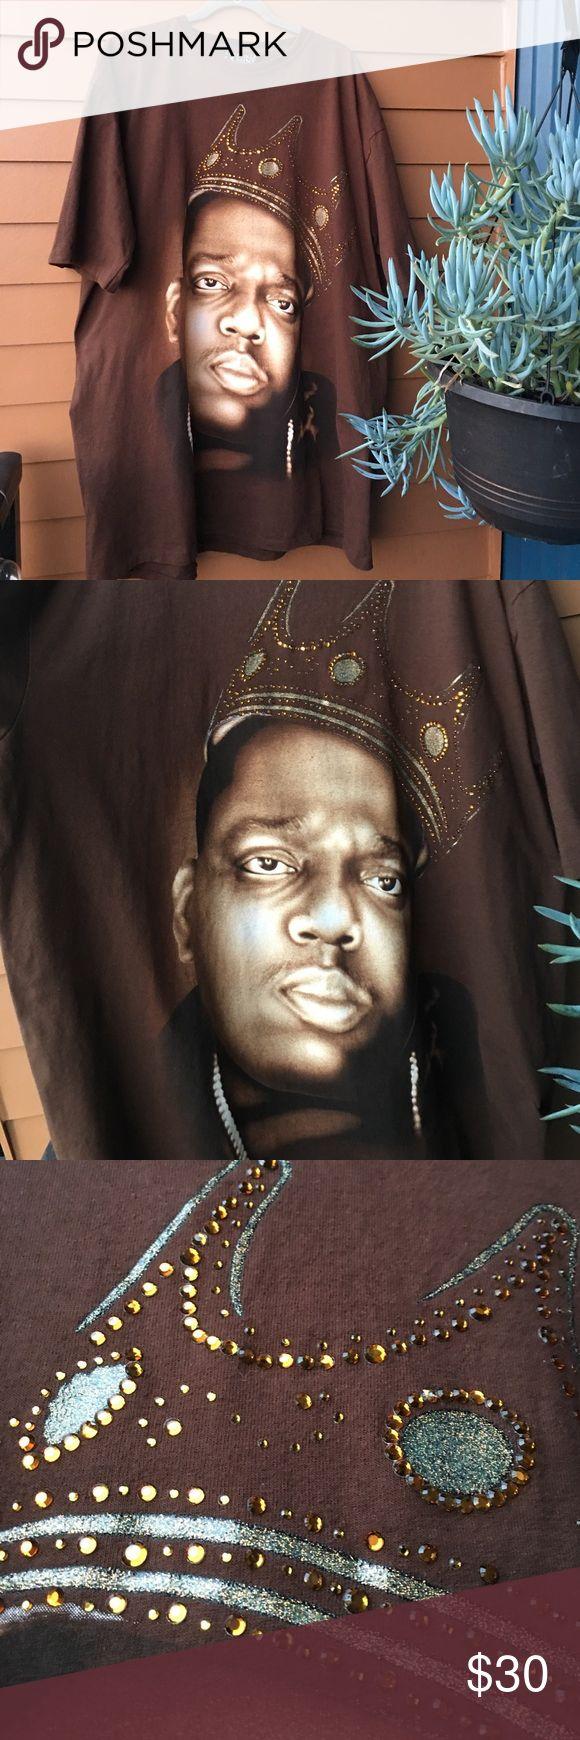 Brooklyn Mint: Notorious B.I.G t shirt Brooklyn Mint: Notorious B.I.G t shirt with jeweled crown on front of shirt / Brown / XXL / Worn a few times Brooklyn Mint Shirts Tees - Short Sleeve